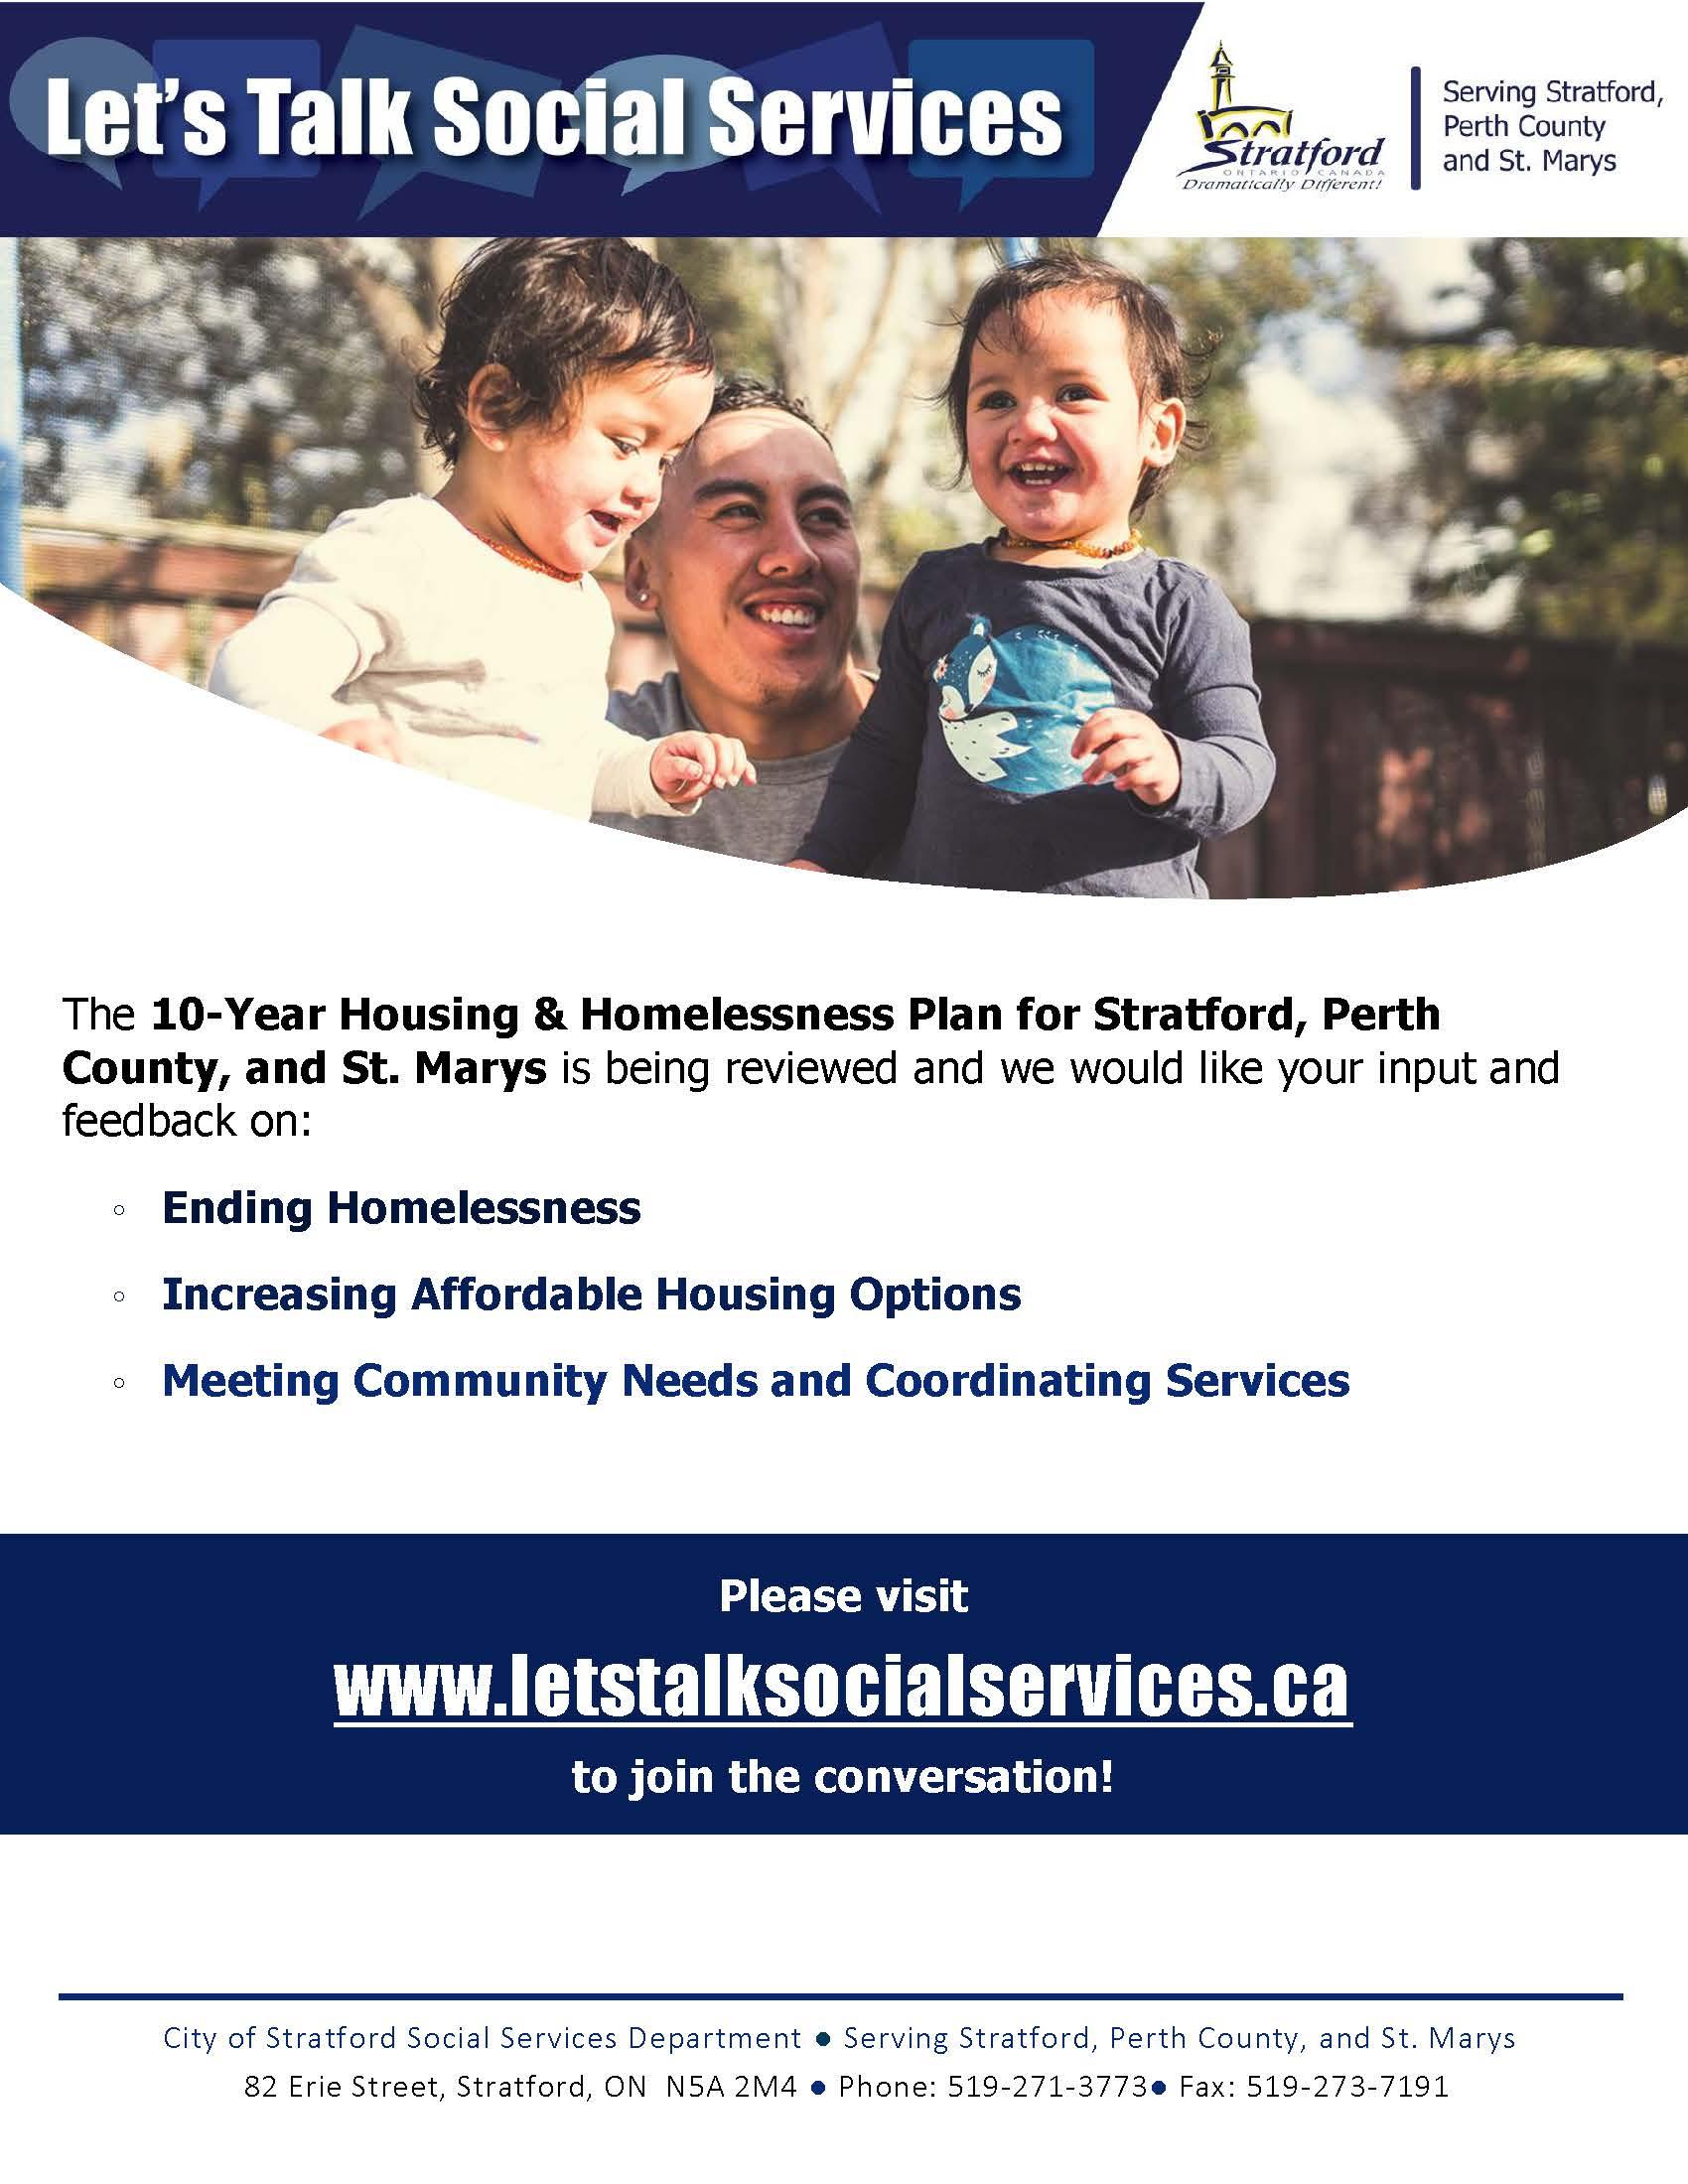 Lets Talk Social Services Poster